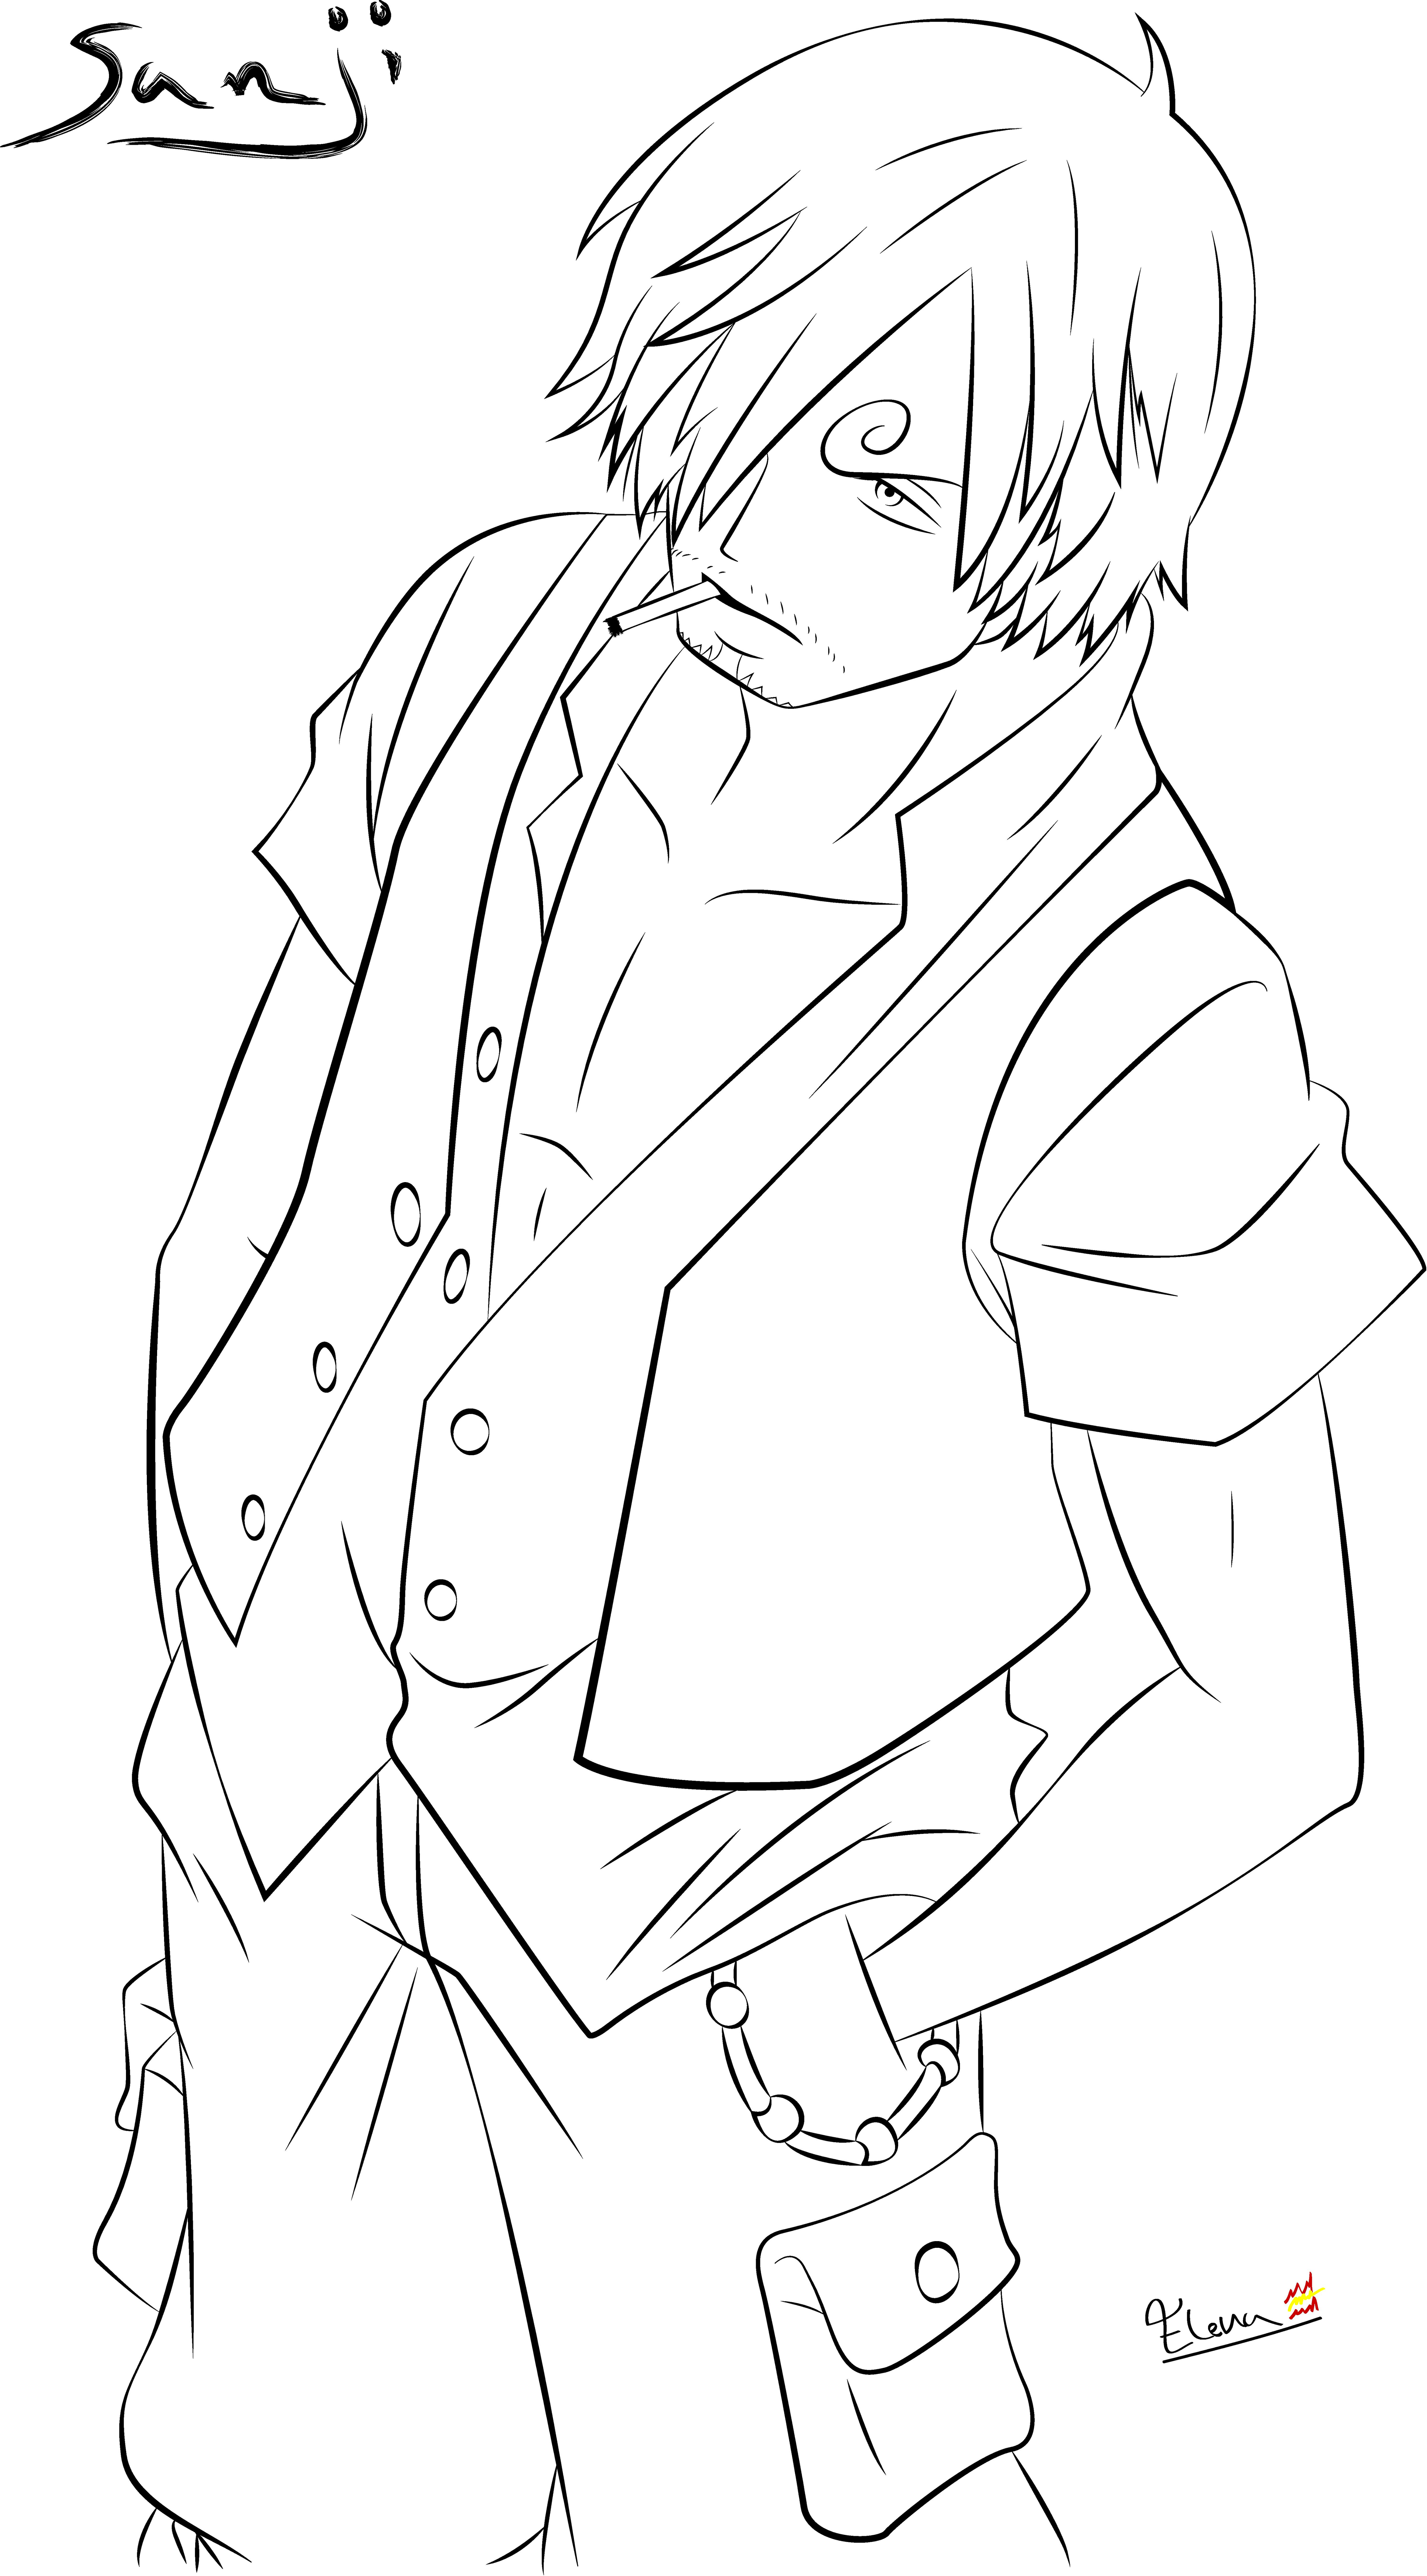 One Piece Lineart : Onepiece lineart sanji by helenha on deviantart